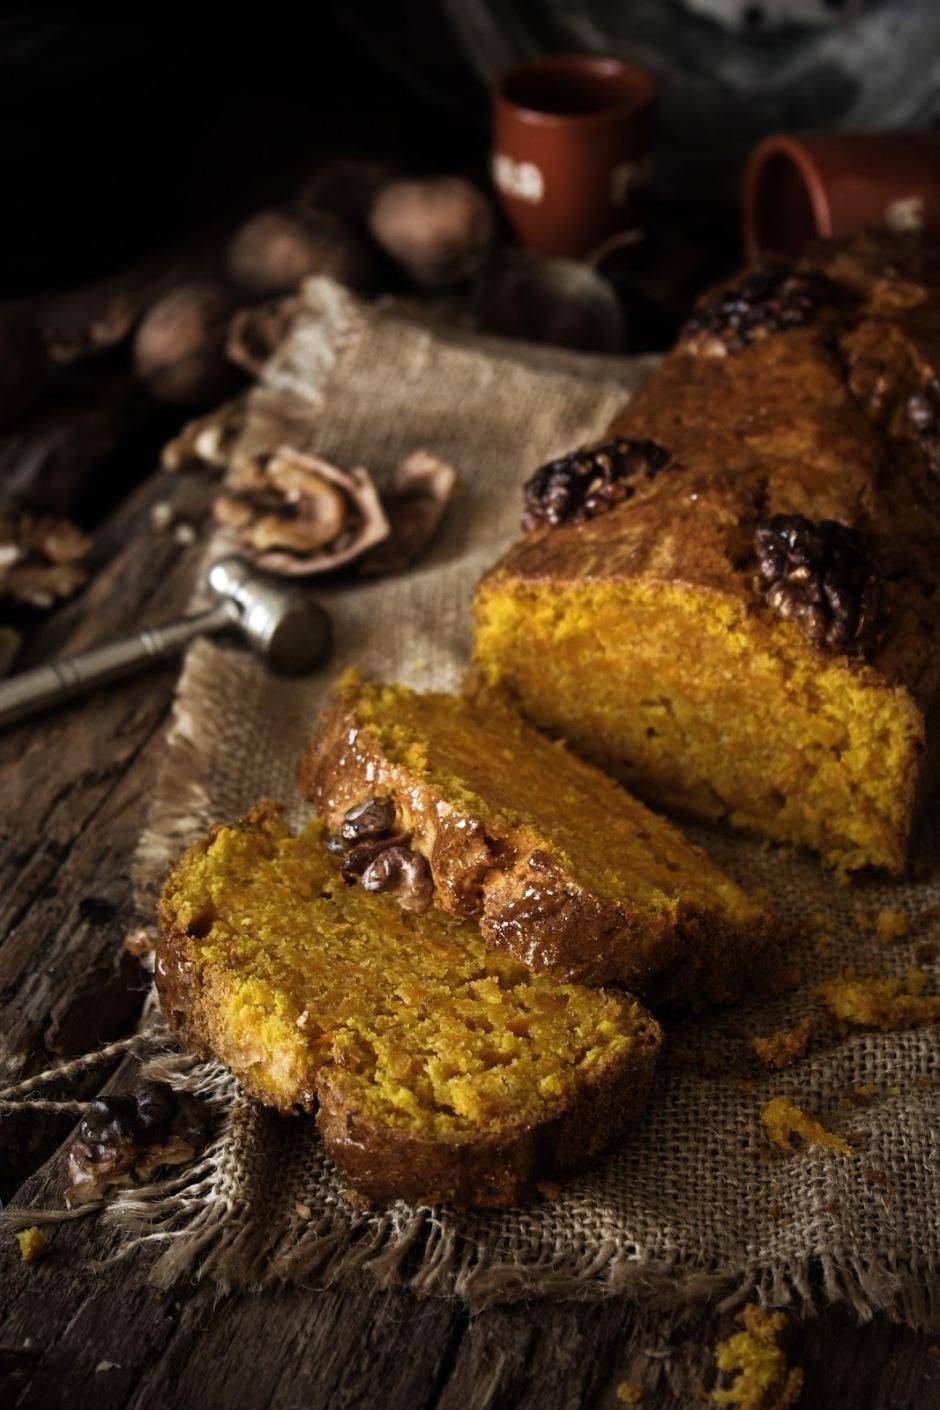 aa177-pumpkincake